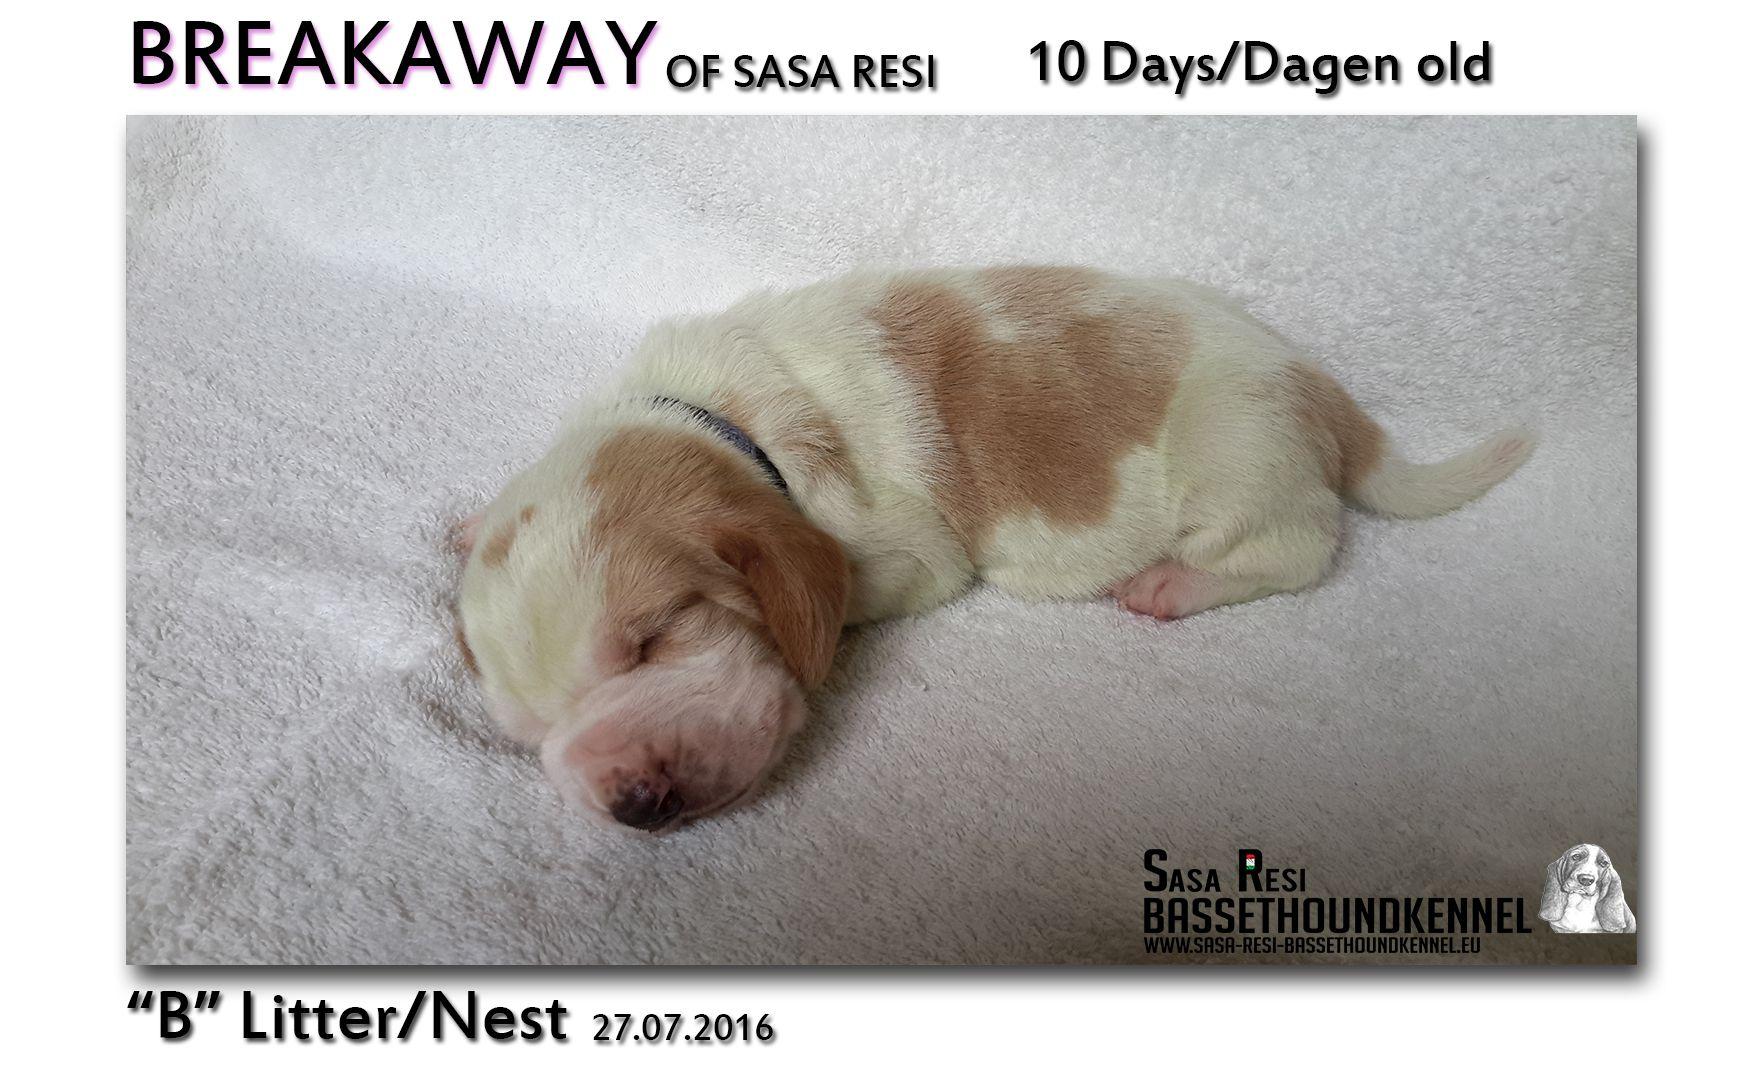 3 1 SaSa ReSi Bassethoundkennel